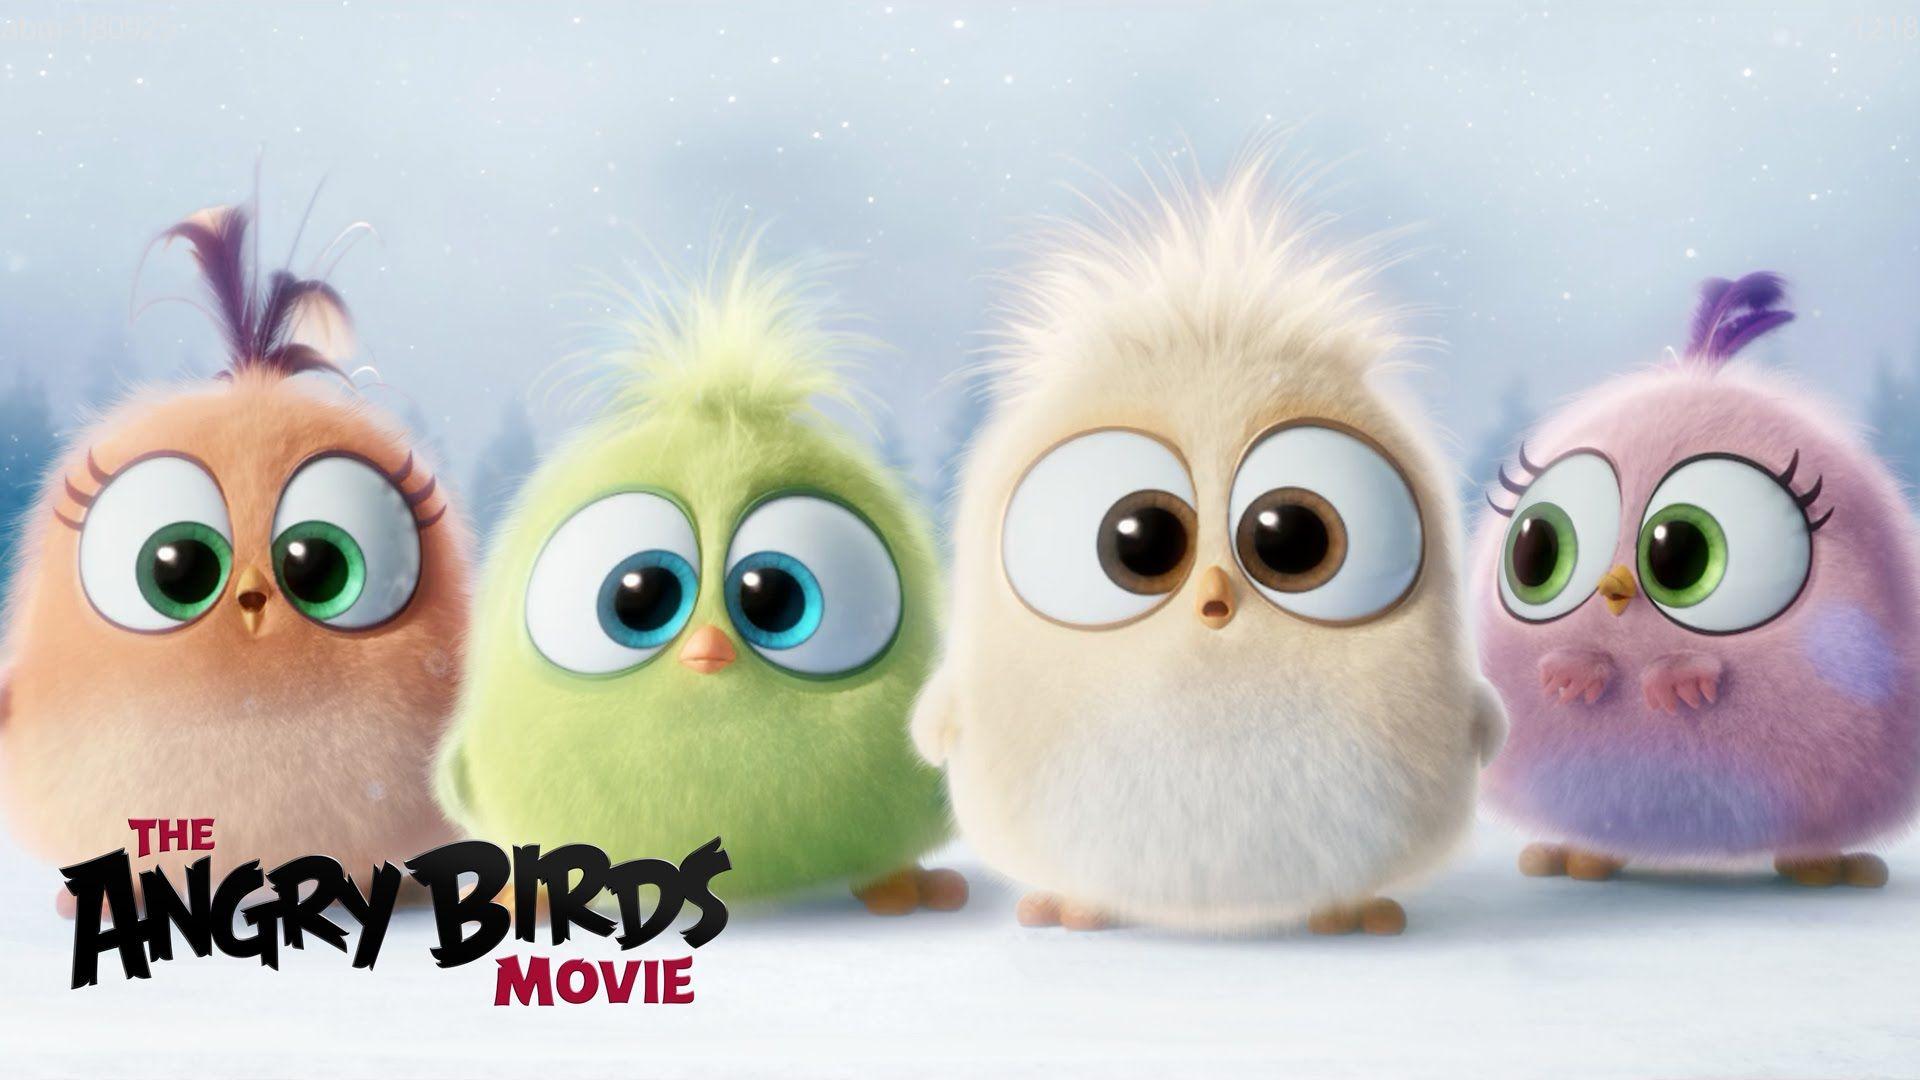 The Angry Birds Movie Season S Greetings From The Hatchlings Angry Birds Movie Angry Birds Cute Cartoon Drawings